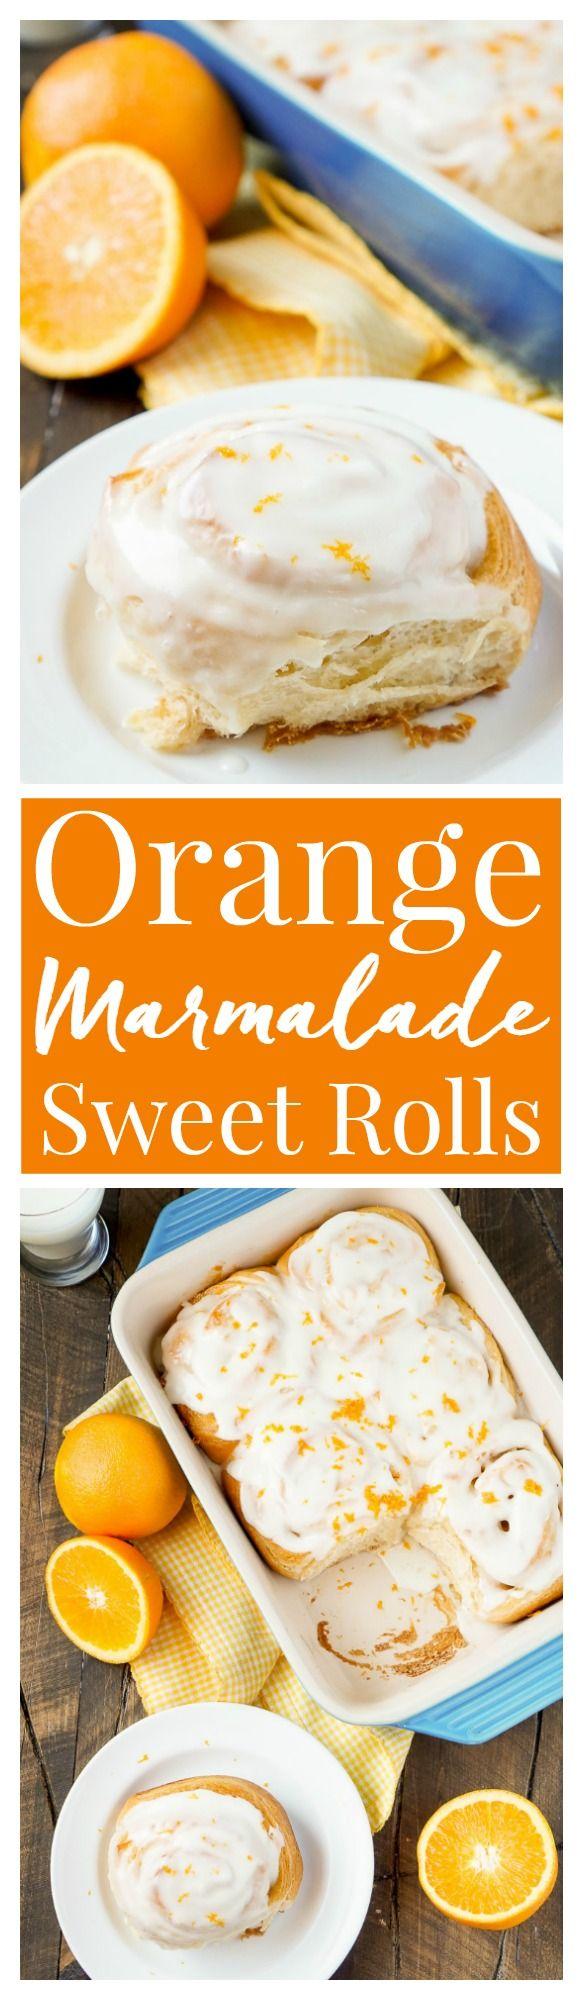 Orange Marmalade Cream Cheese Sweet Rolls | Recipe | Marmalade, Sweet ...